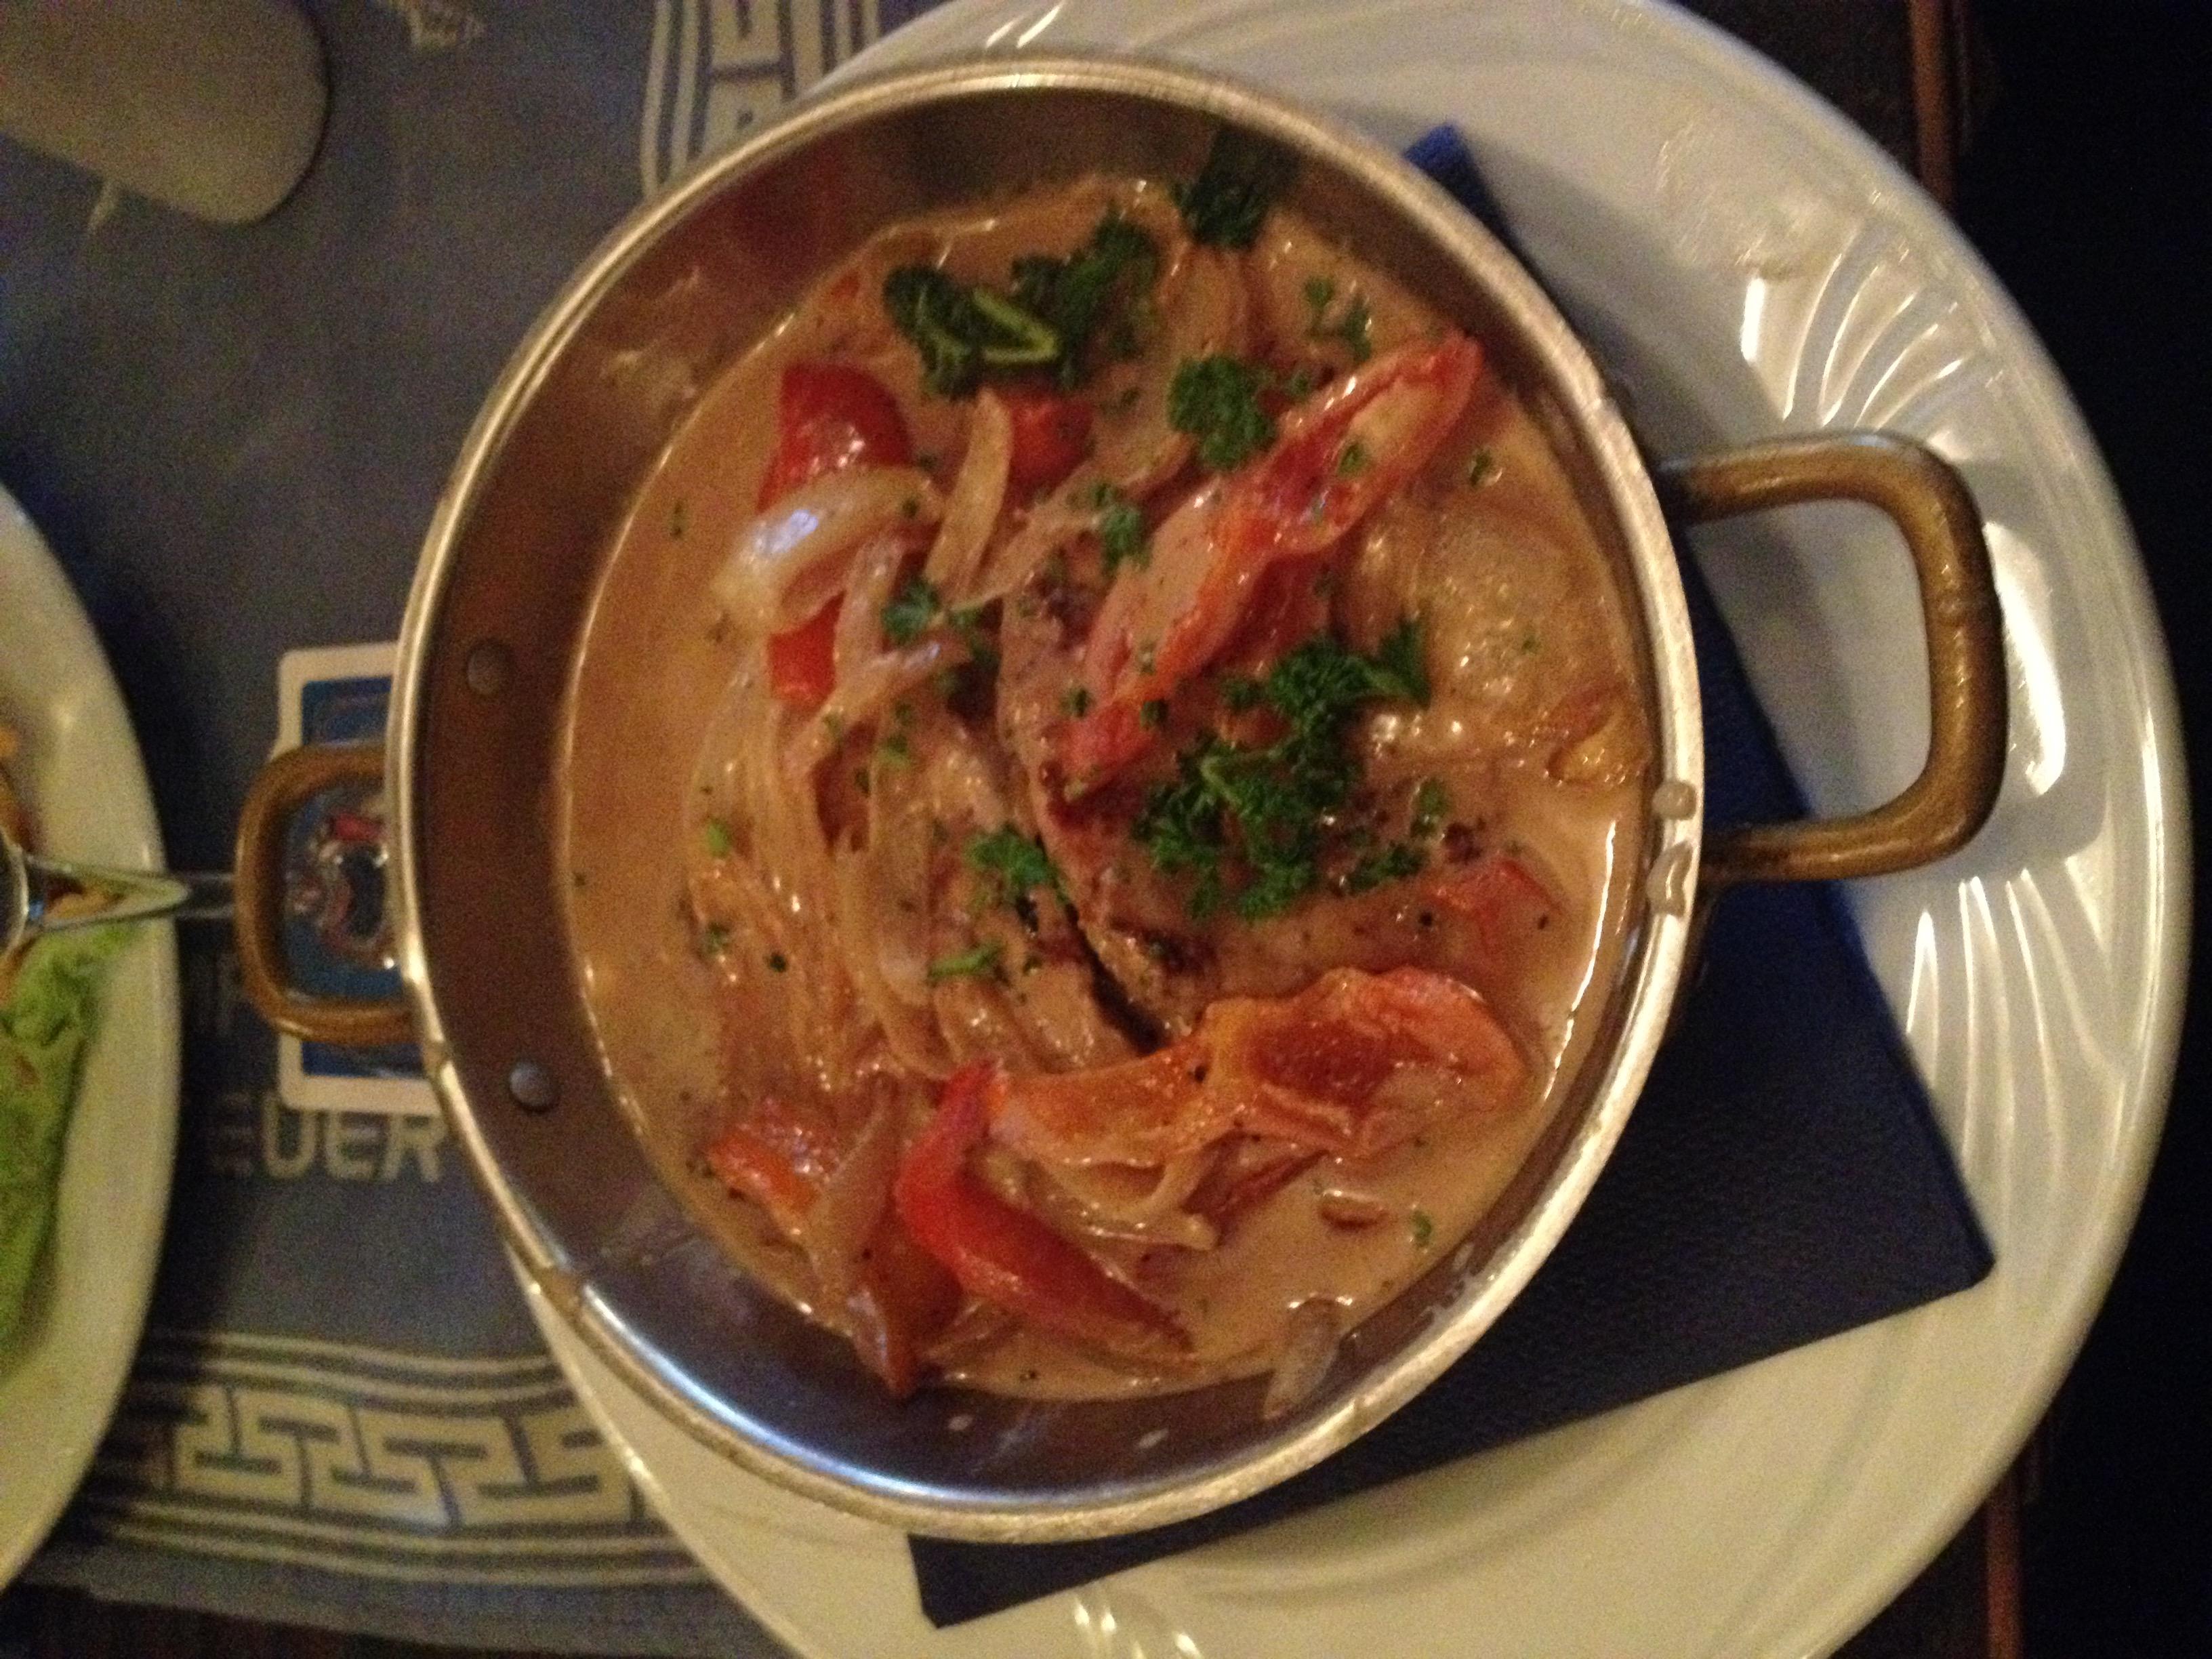 http://foodloader.net/BrollyLSSJ_2015-11-15_Olympisches_Feuer_-_Schnitzel_.jpg